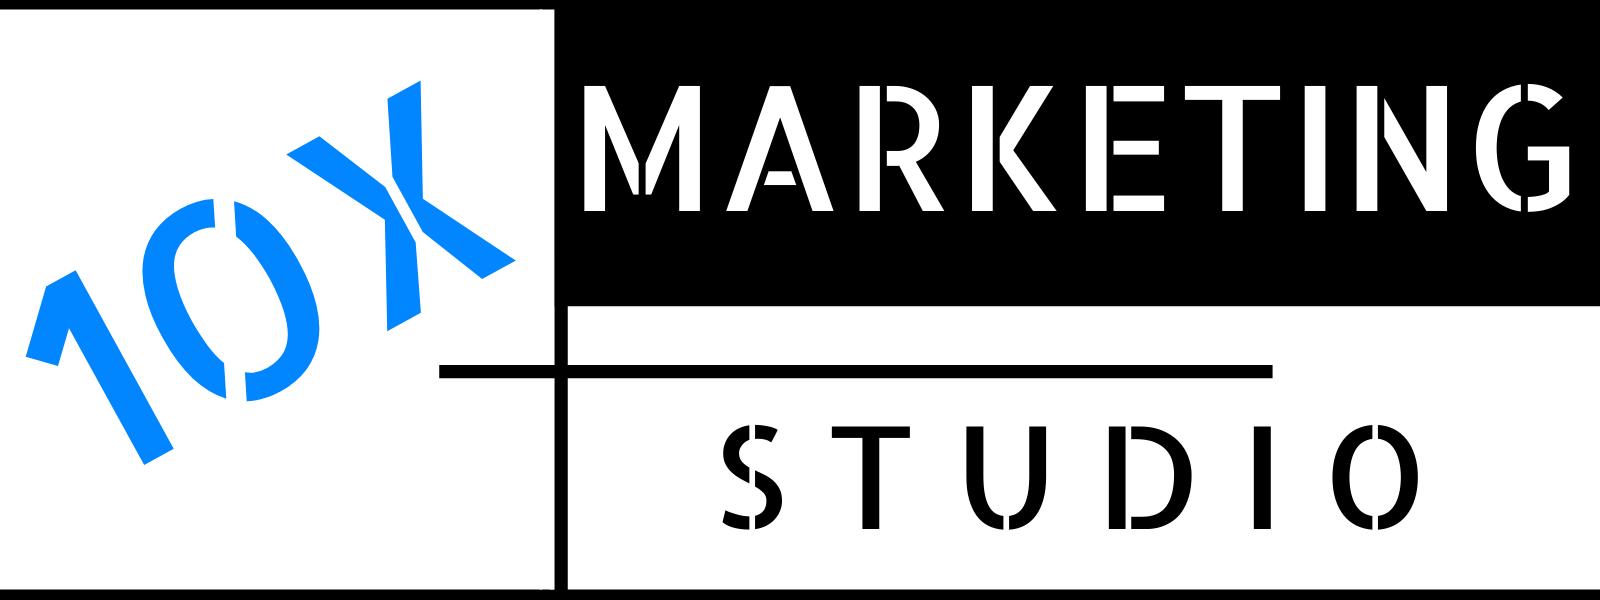 10x Marketing Studio, a chatbot developer